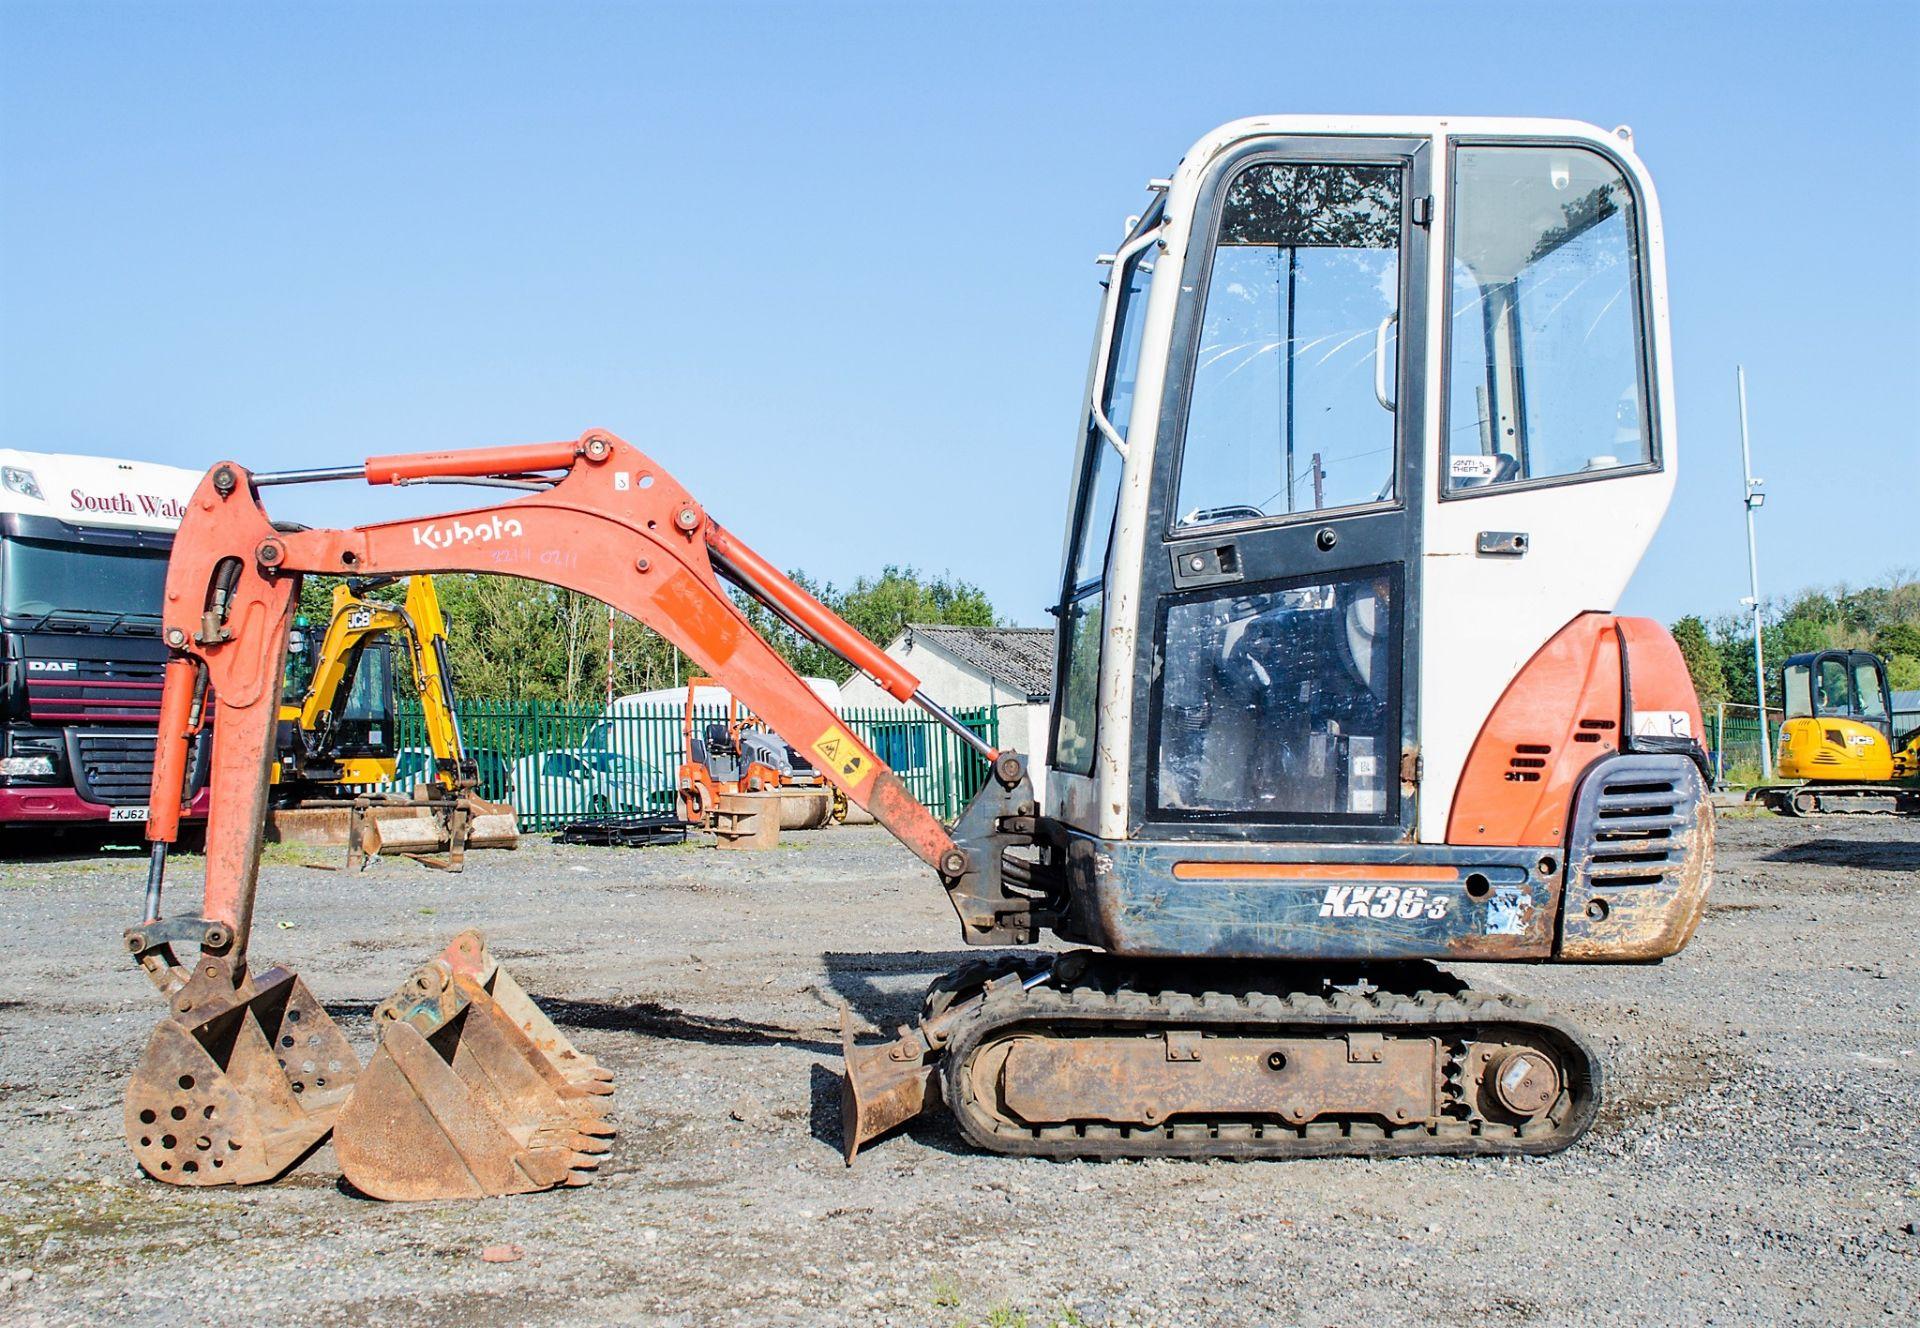 Kubota KX36-3 1.5 tonne rubber tracked mini excavator Year: 2007 S/N: Z077298 Recorded Hours: 4205 - Image 7 of 18